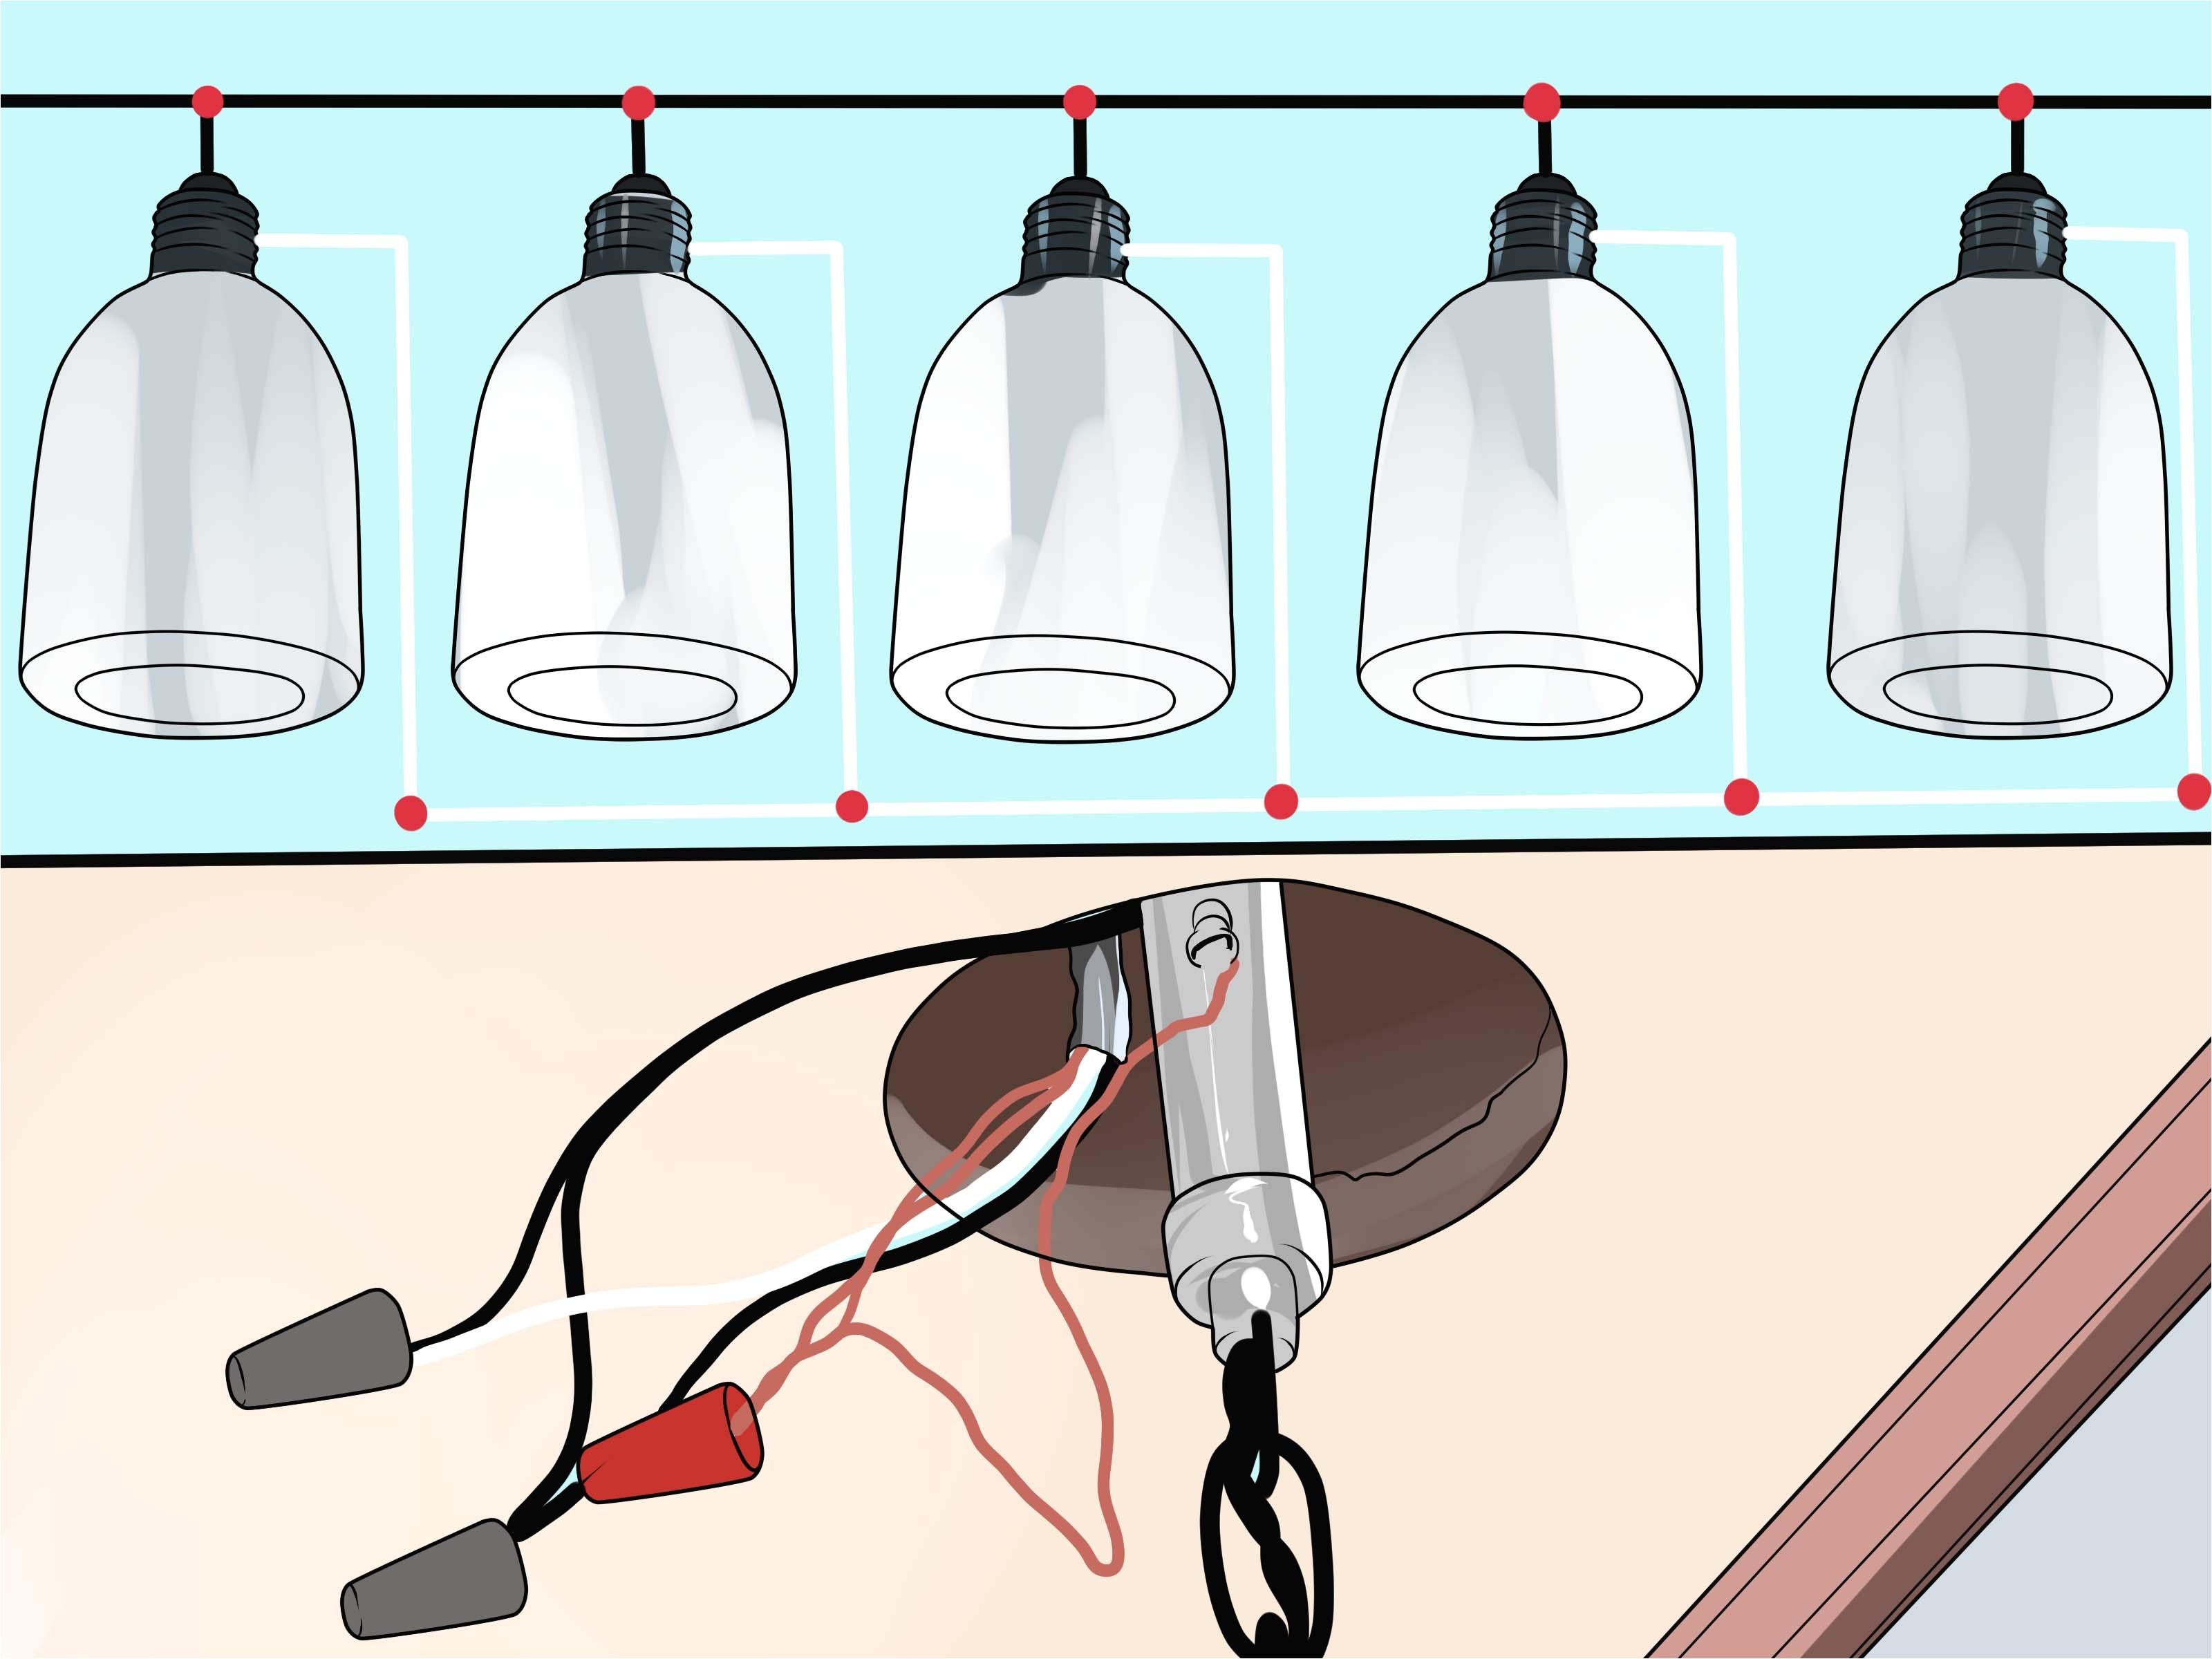 daisy chain lights step 18 version 2